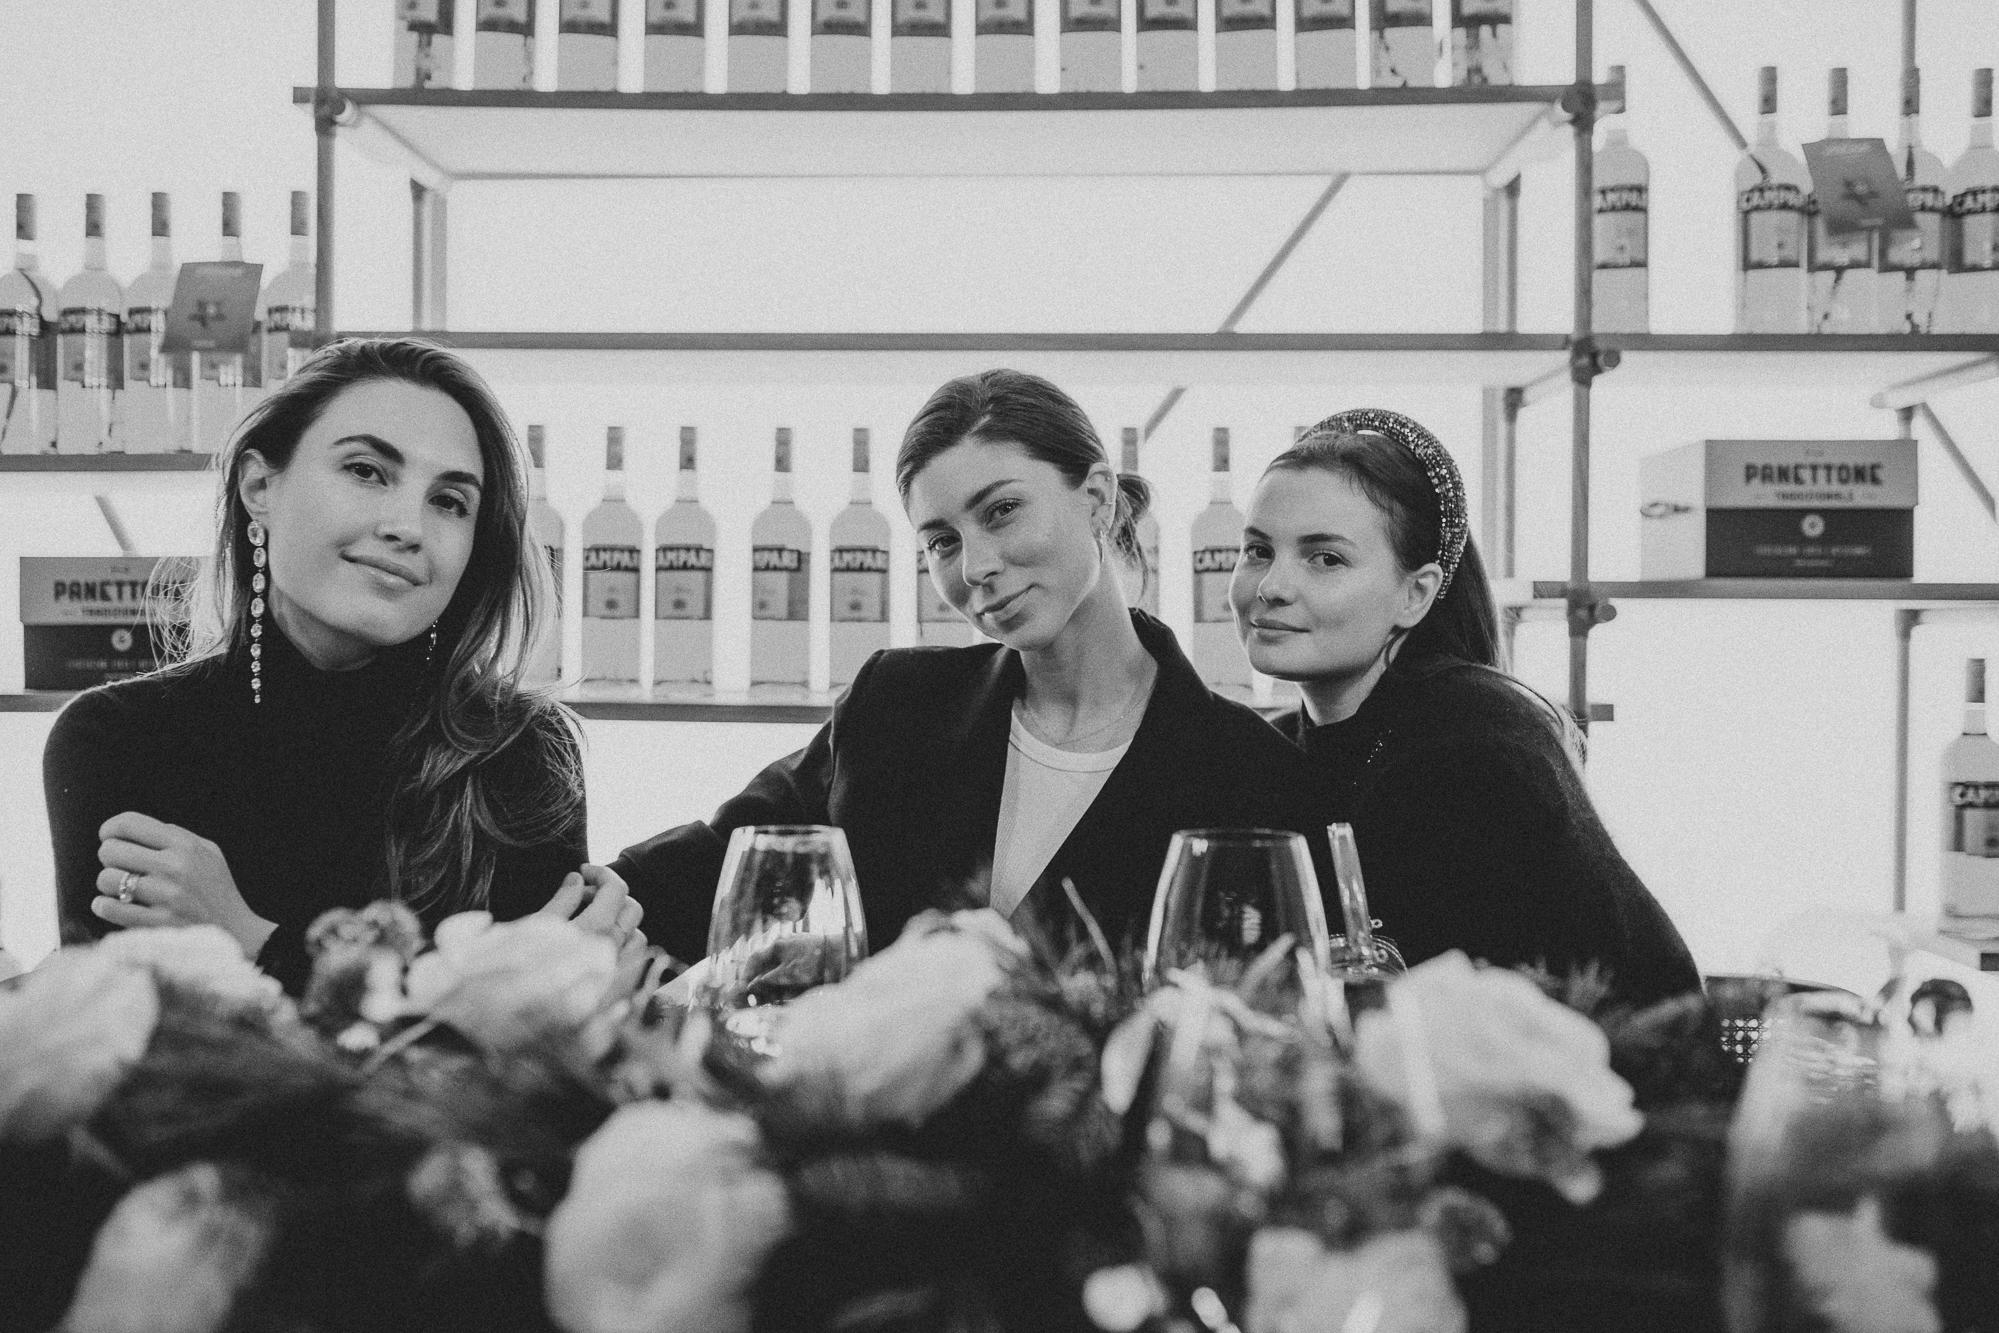 TDD Christmas Dinner 2019: Pastamara Italiener Wien im Ritz Carlton - Love Daily Dose